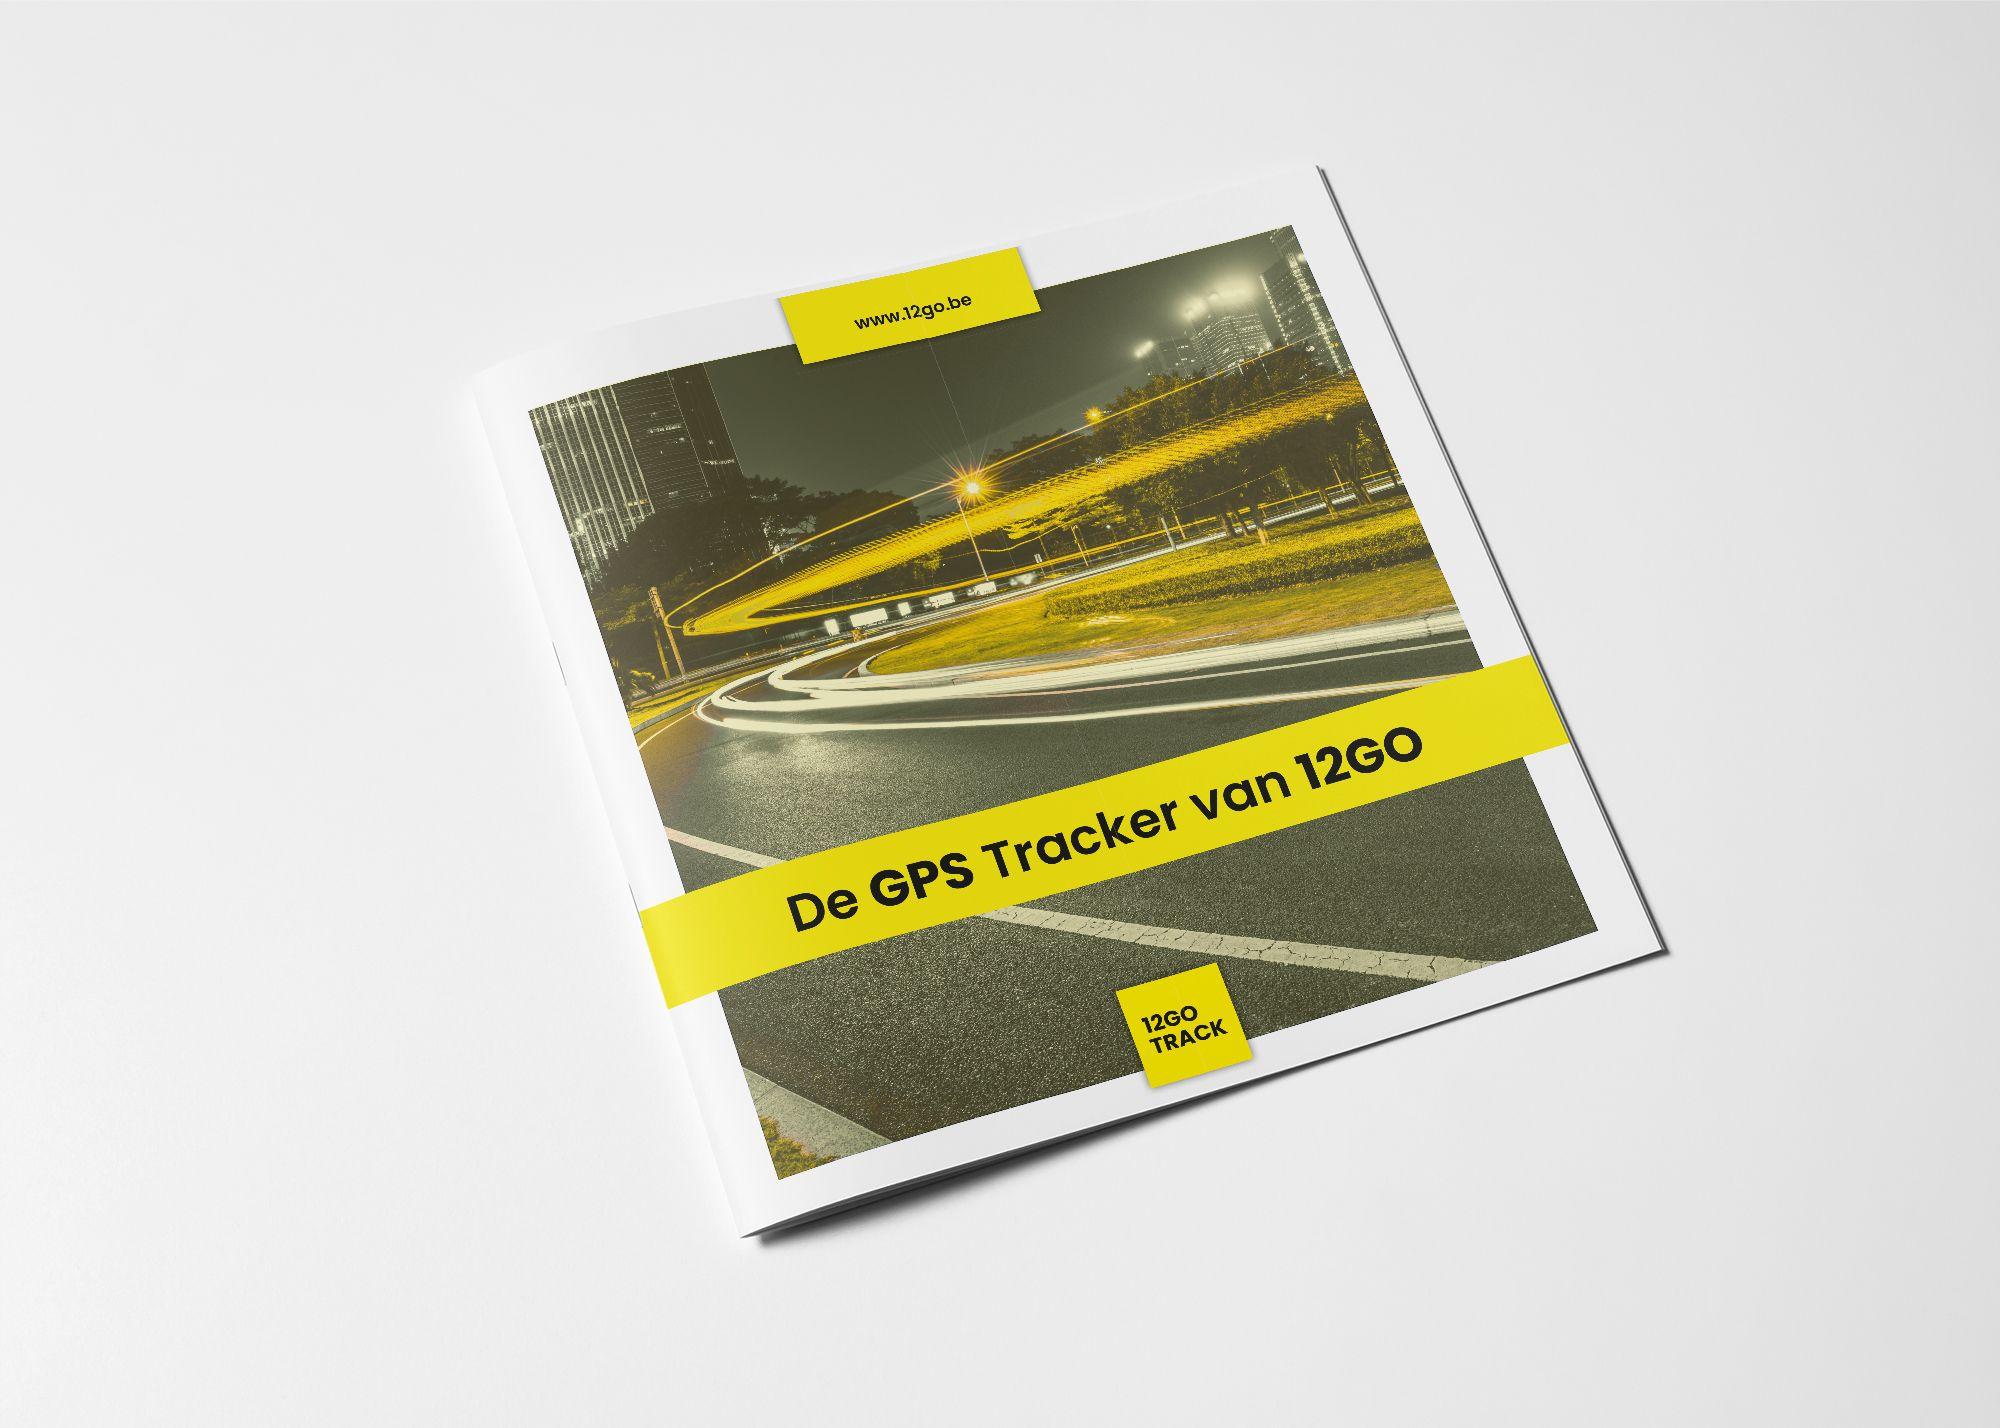 12GO-Track